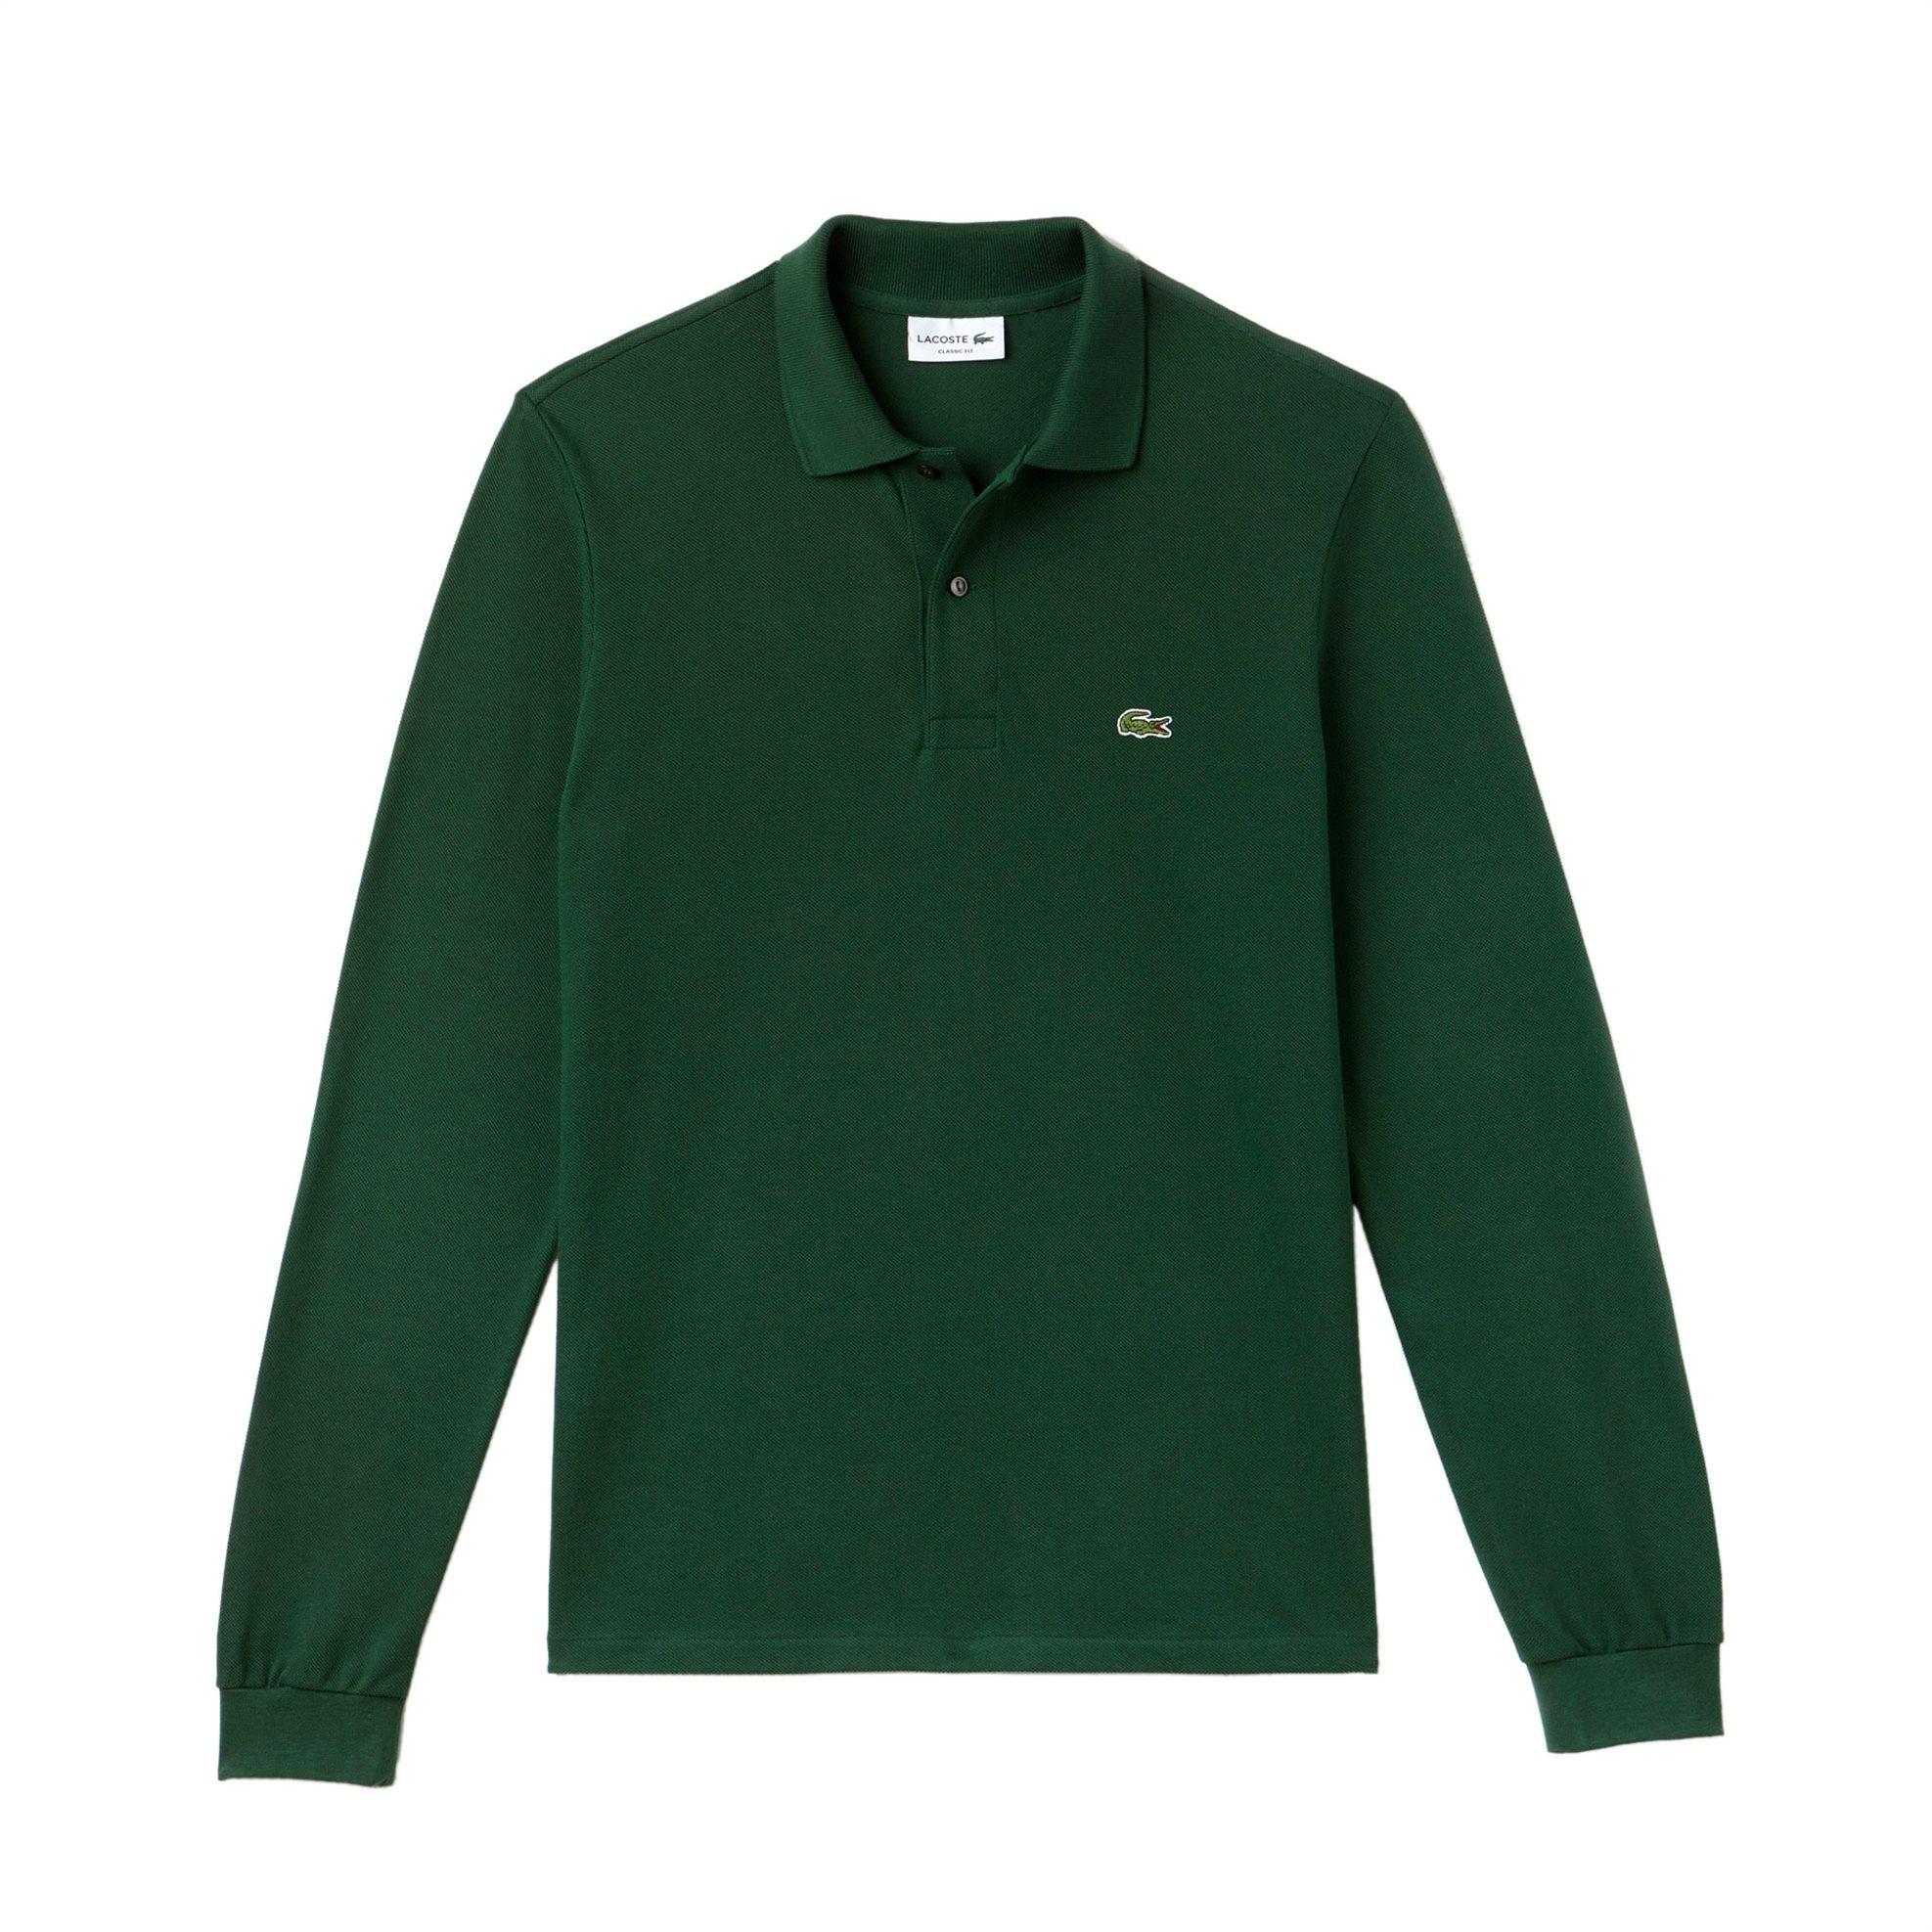 Lacoste ανδρική μπλούζα Polo L.12.12 με μακρύ μανίκι - L1312 - Κυπαρισσί ανδρασ   ρουχα    νεεσ αφιξεισ   μπλούζες   πόλο